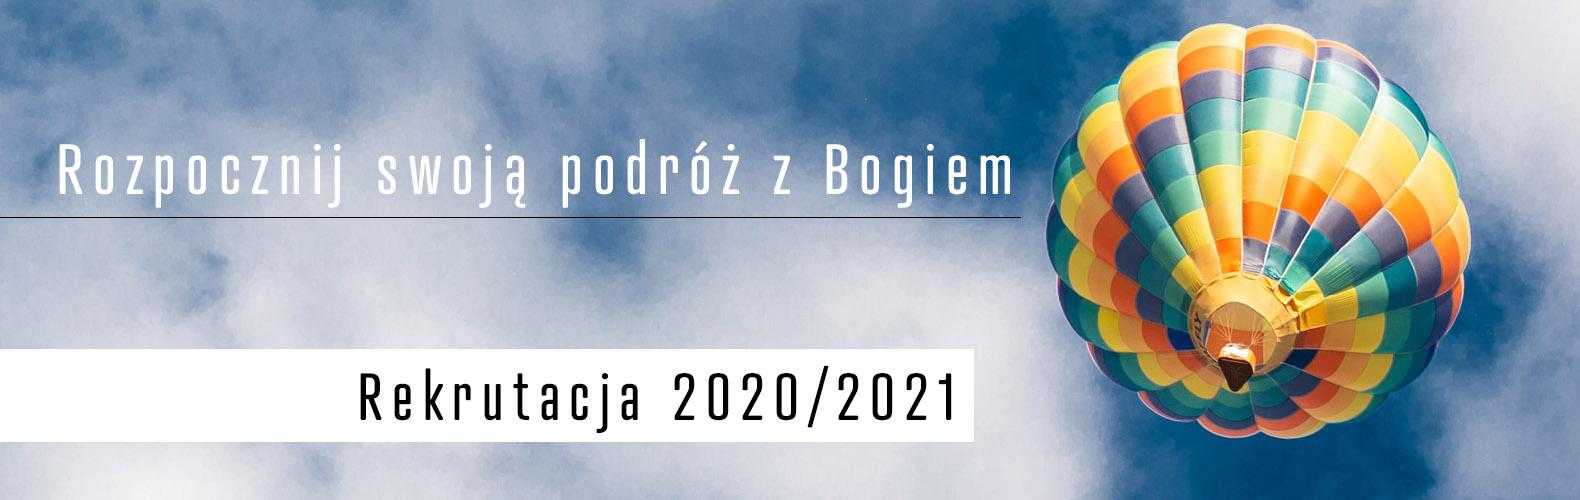 rekrutacja 2020_21